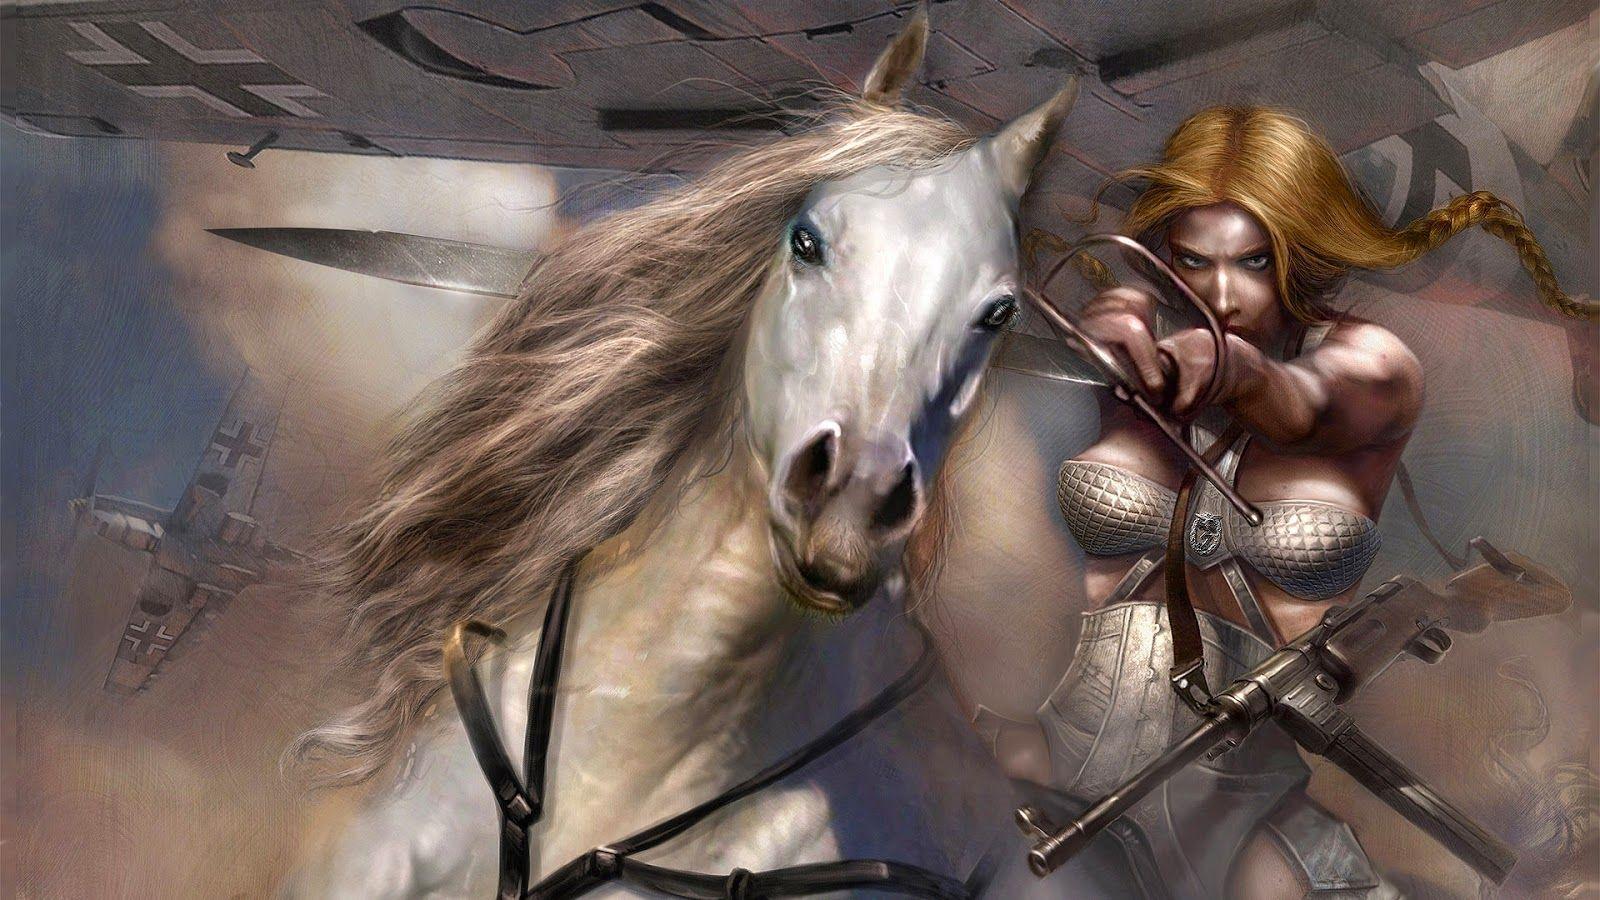 Download Wallpaper Horse Angel - 912920bfa0983036f72b92fa728d0654  Picture_93628.jpg